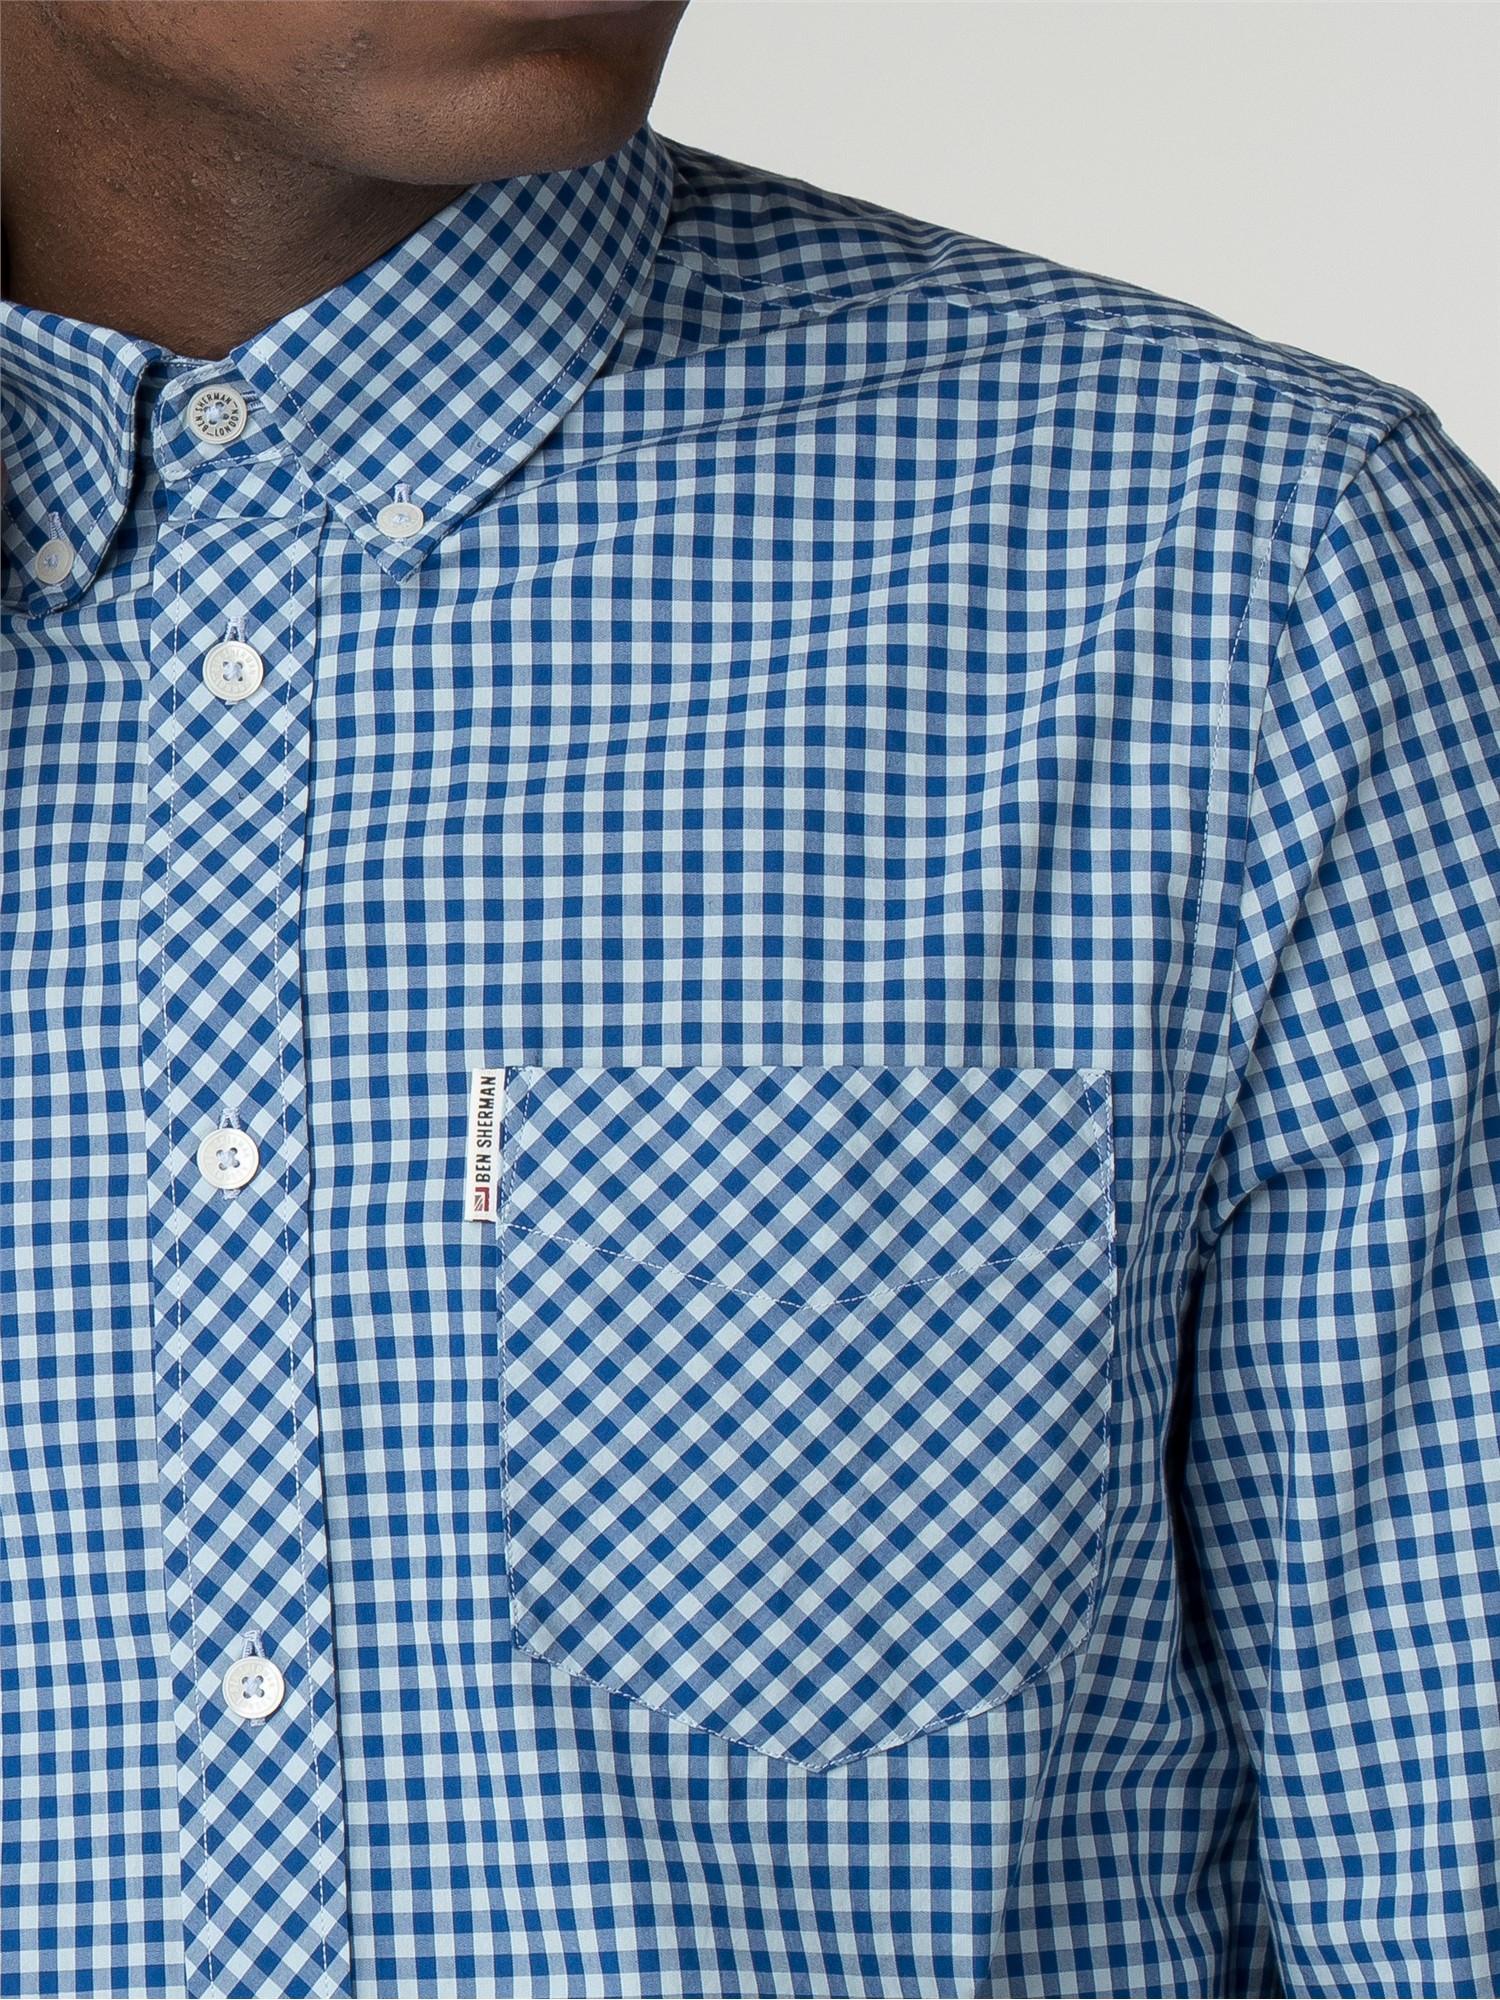 Ben Sherman Mens Ls Classic Gingham Shirt